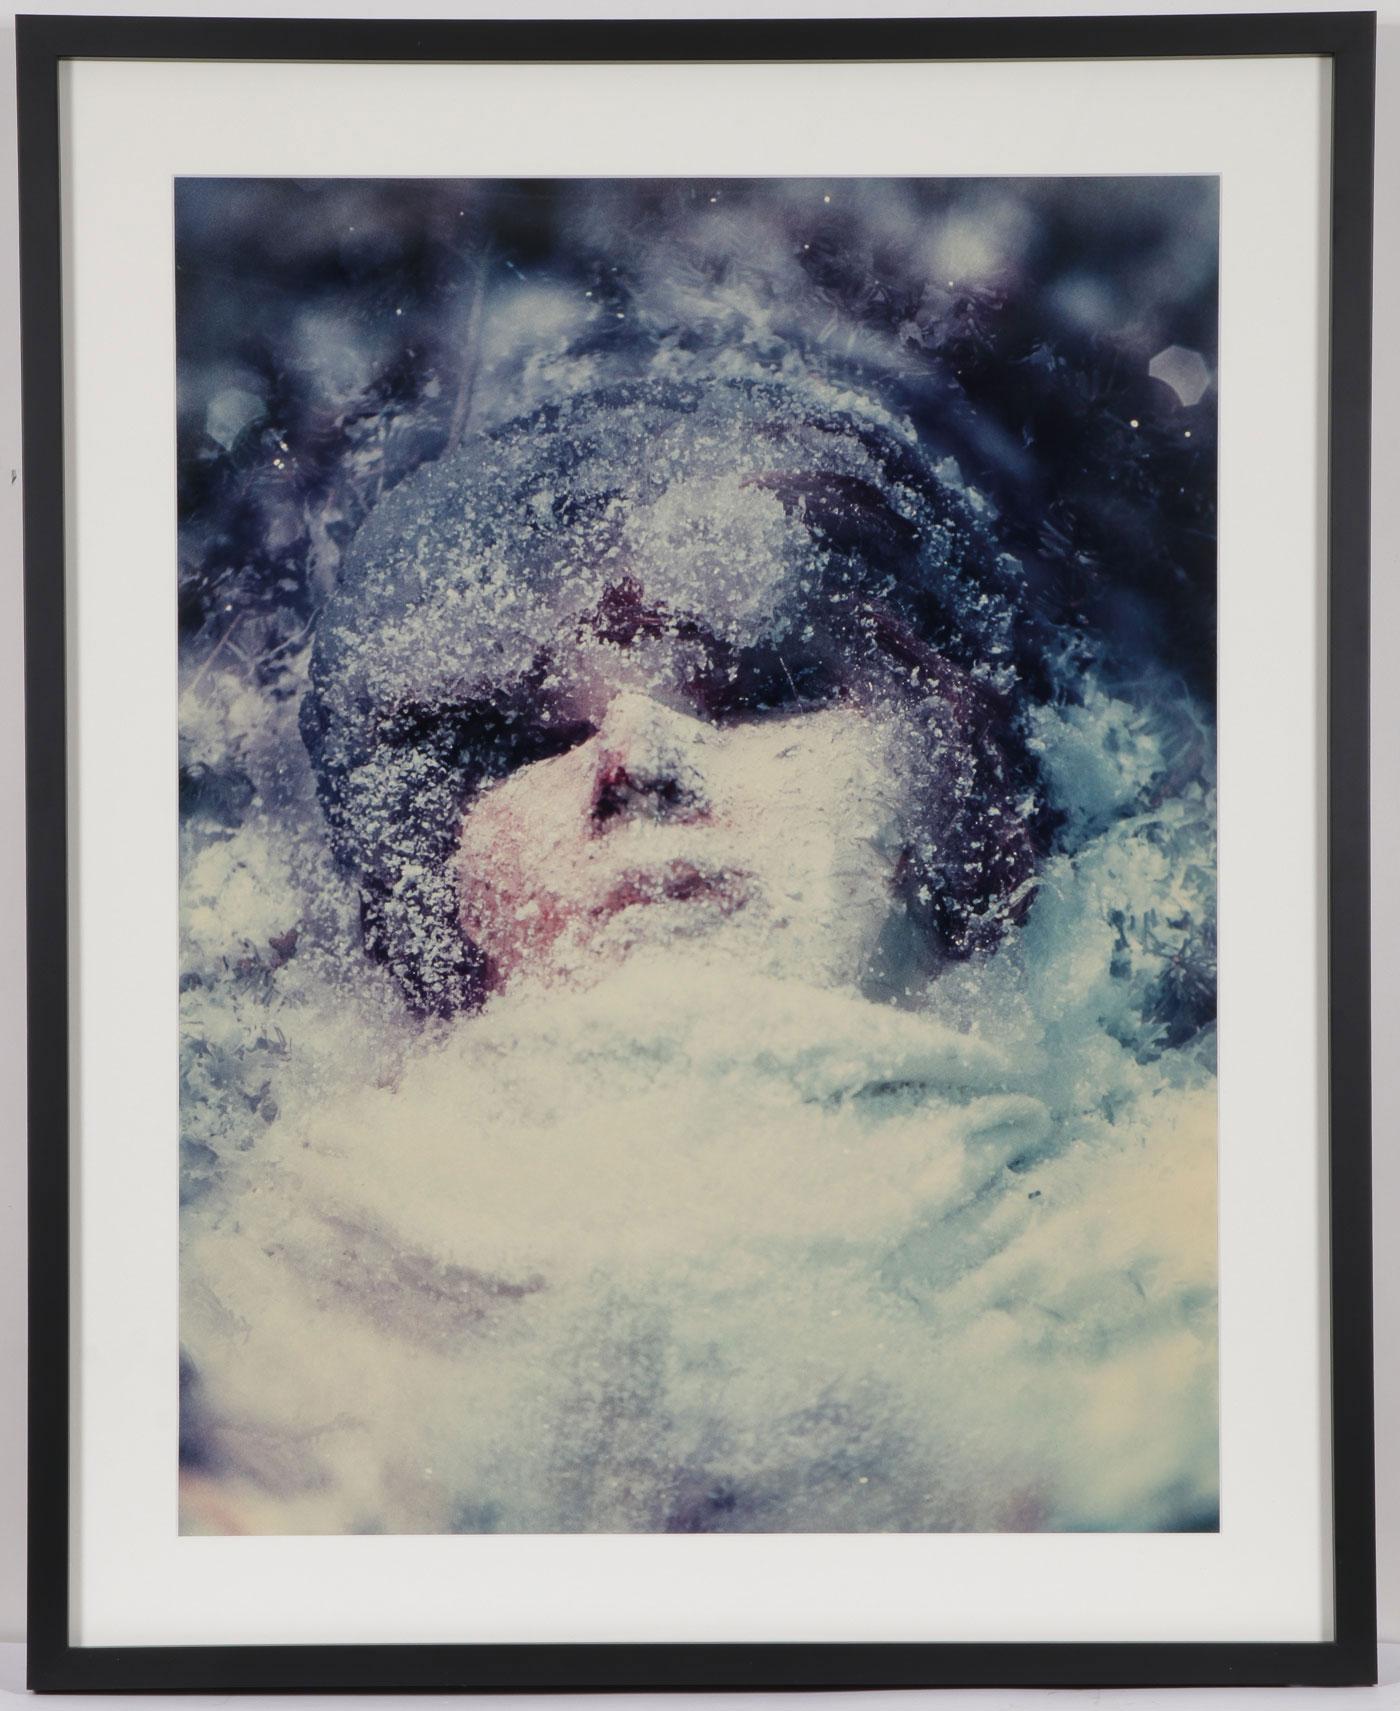 CINDY SHERMAN SIGNED PHOTO - Image 2 of 7